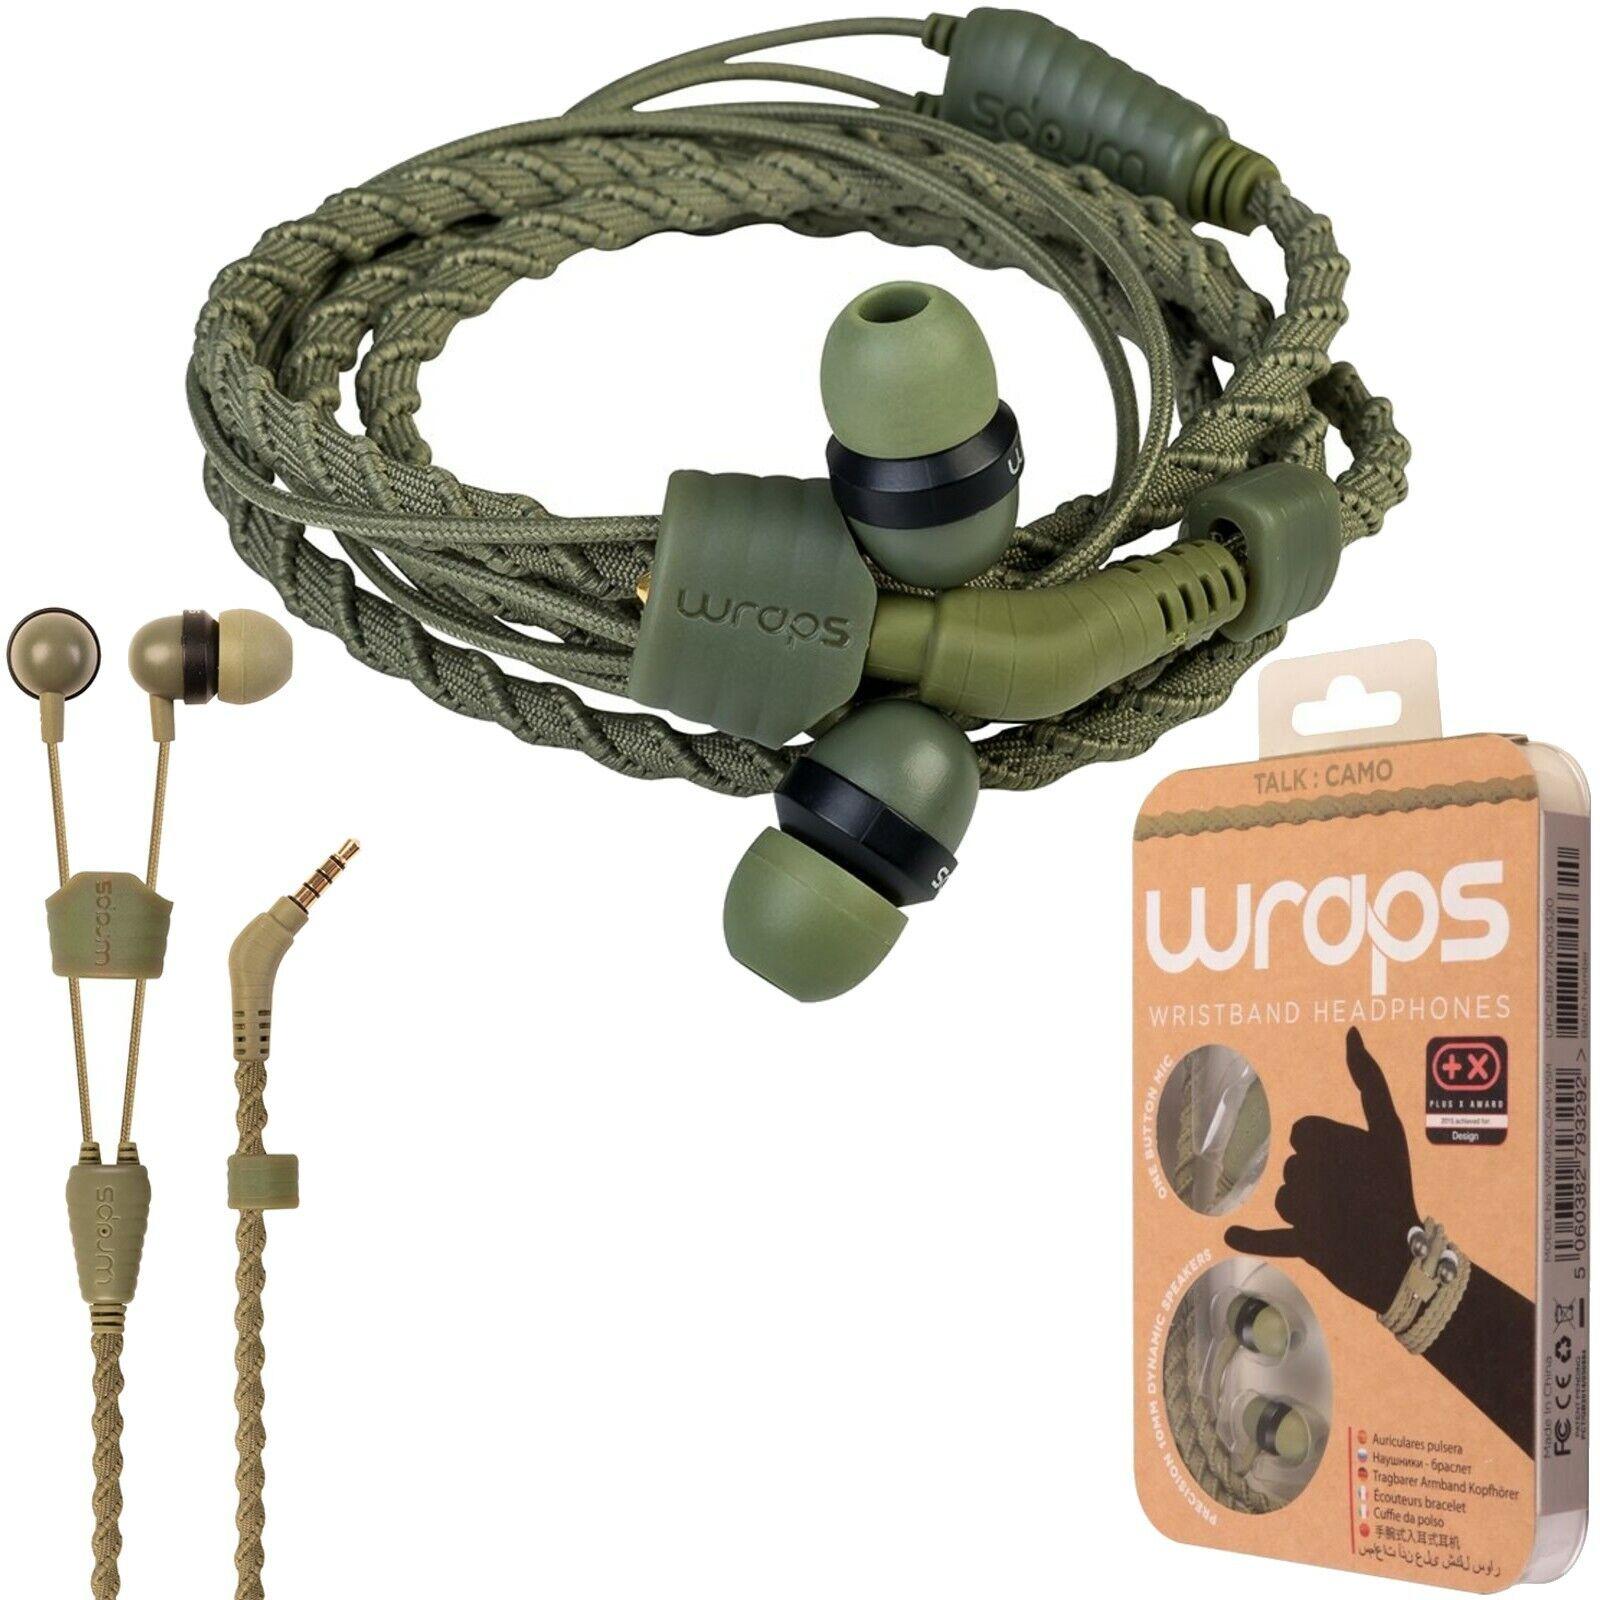 Wraps Wristband Headphones Anti Tangle In-Ear Earphones & Mi